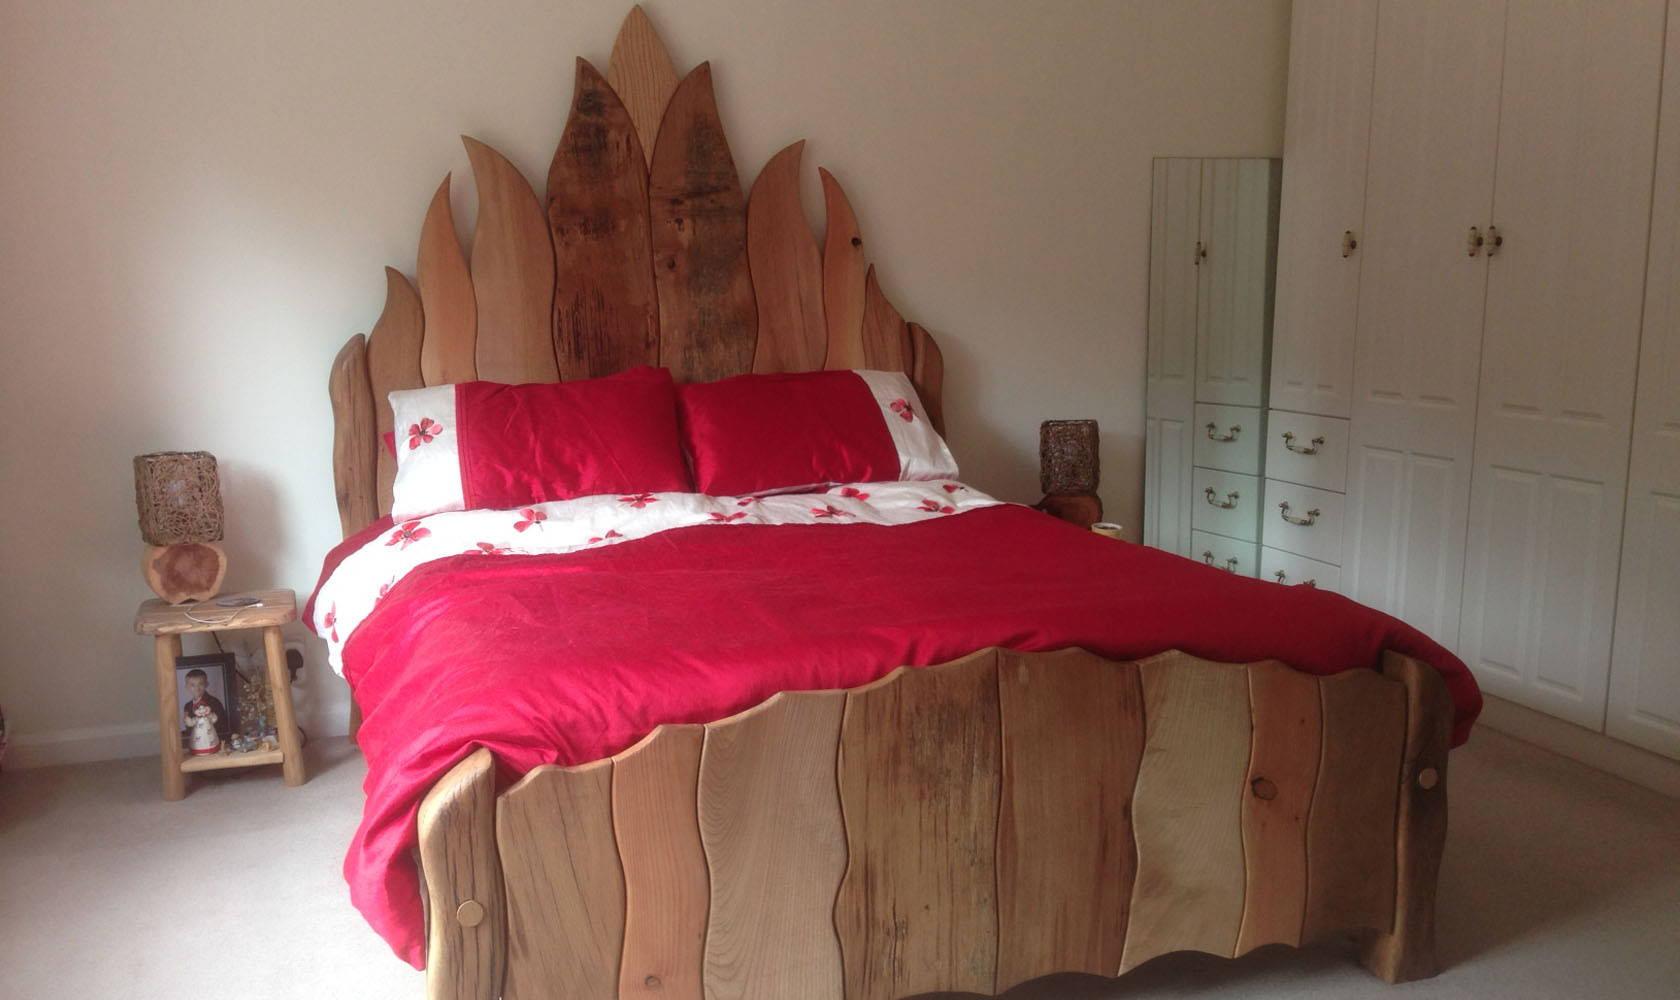 handmade curvy bed